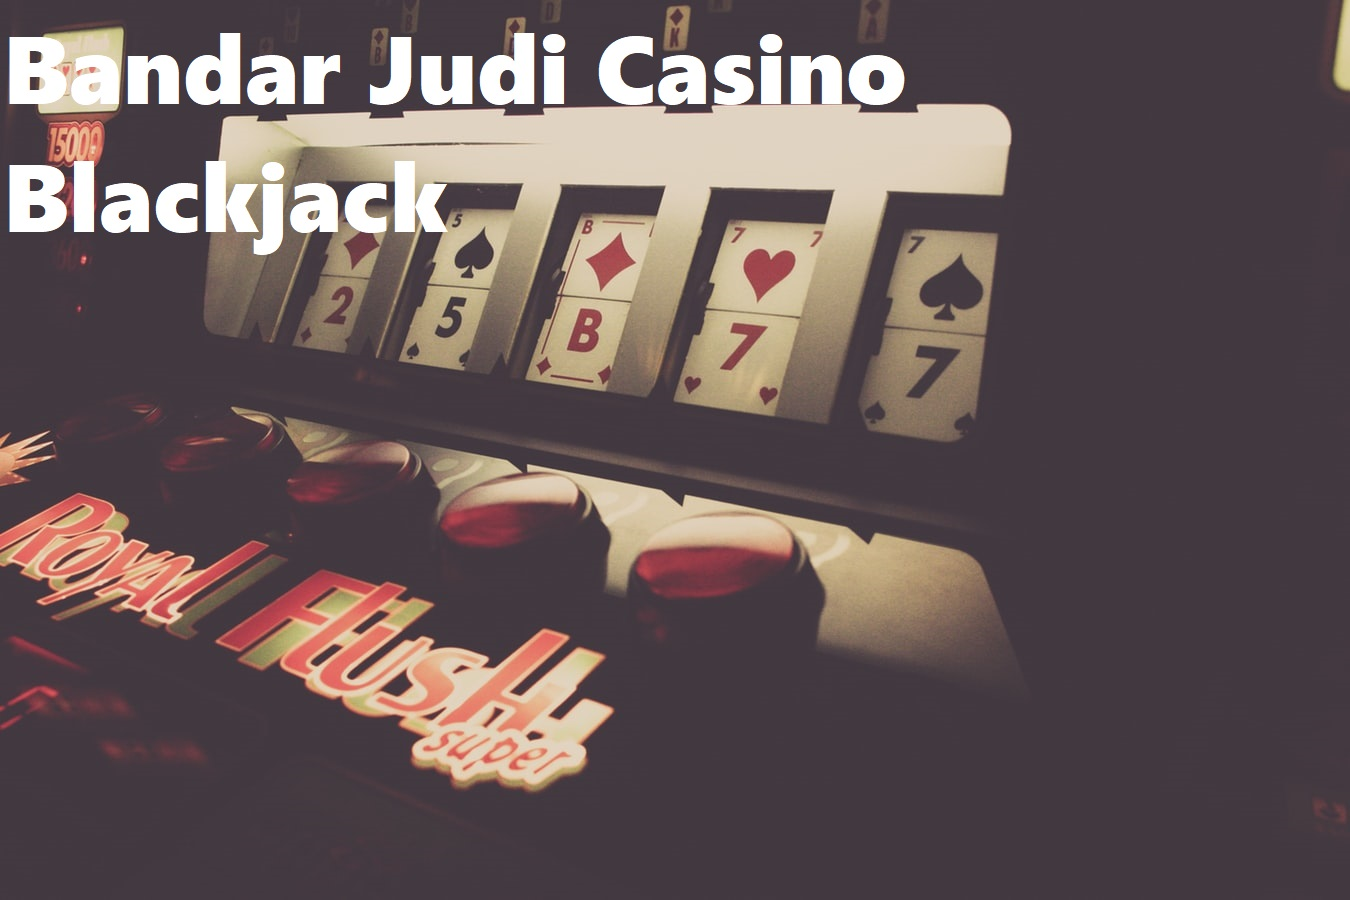 Bandar Judi Casino Blackjack